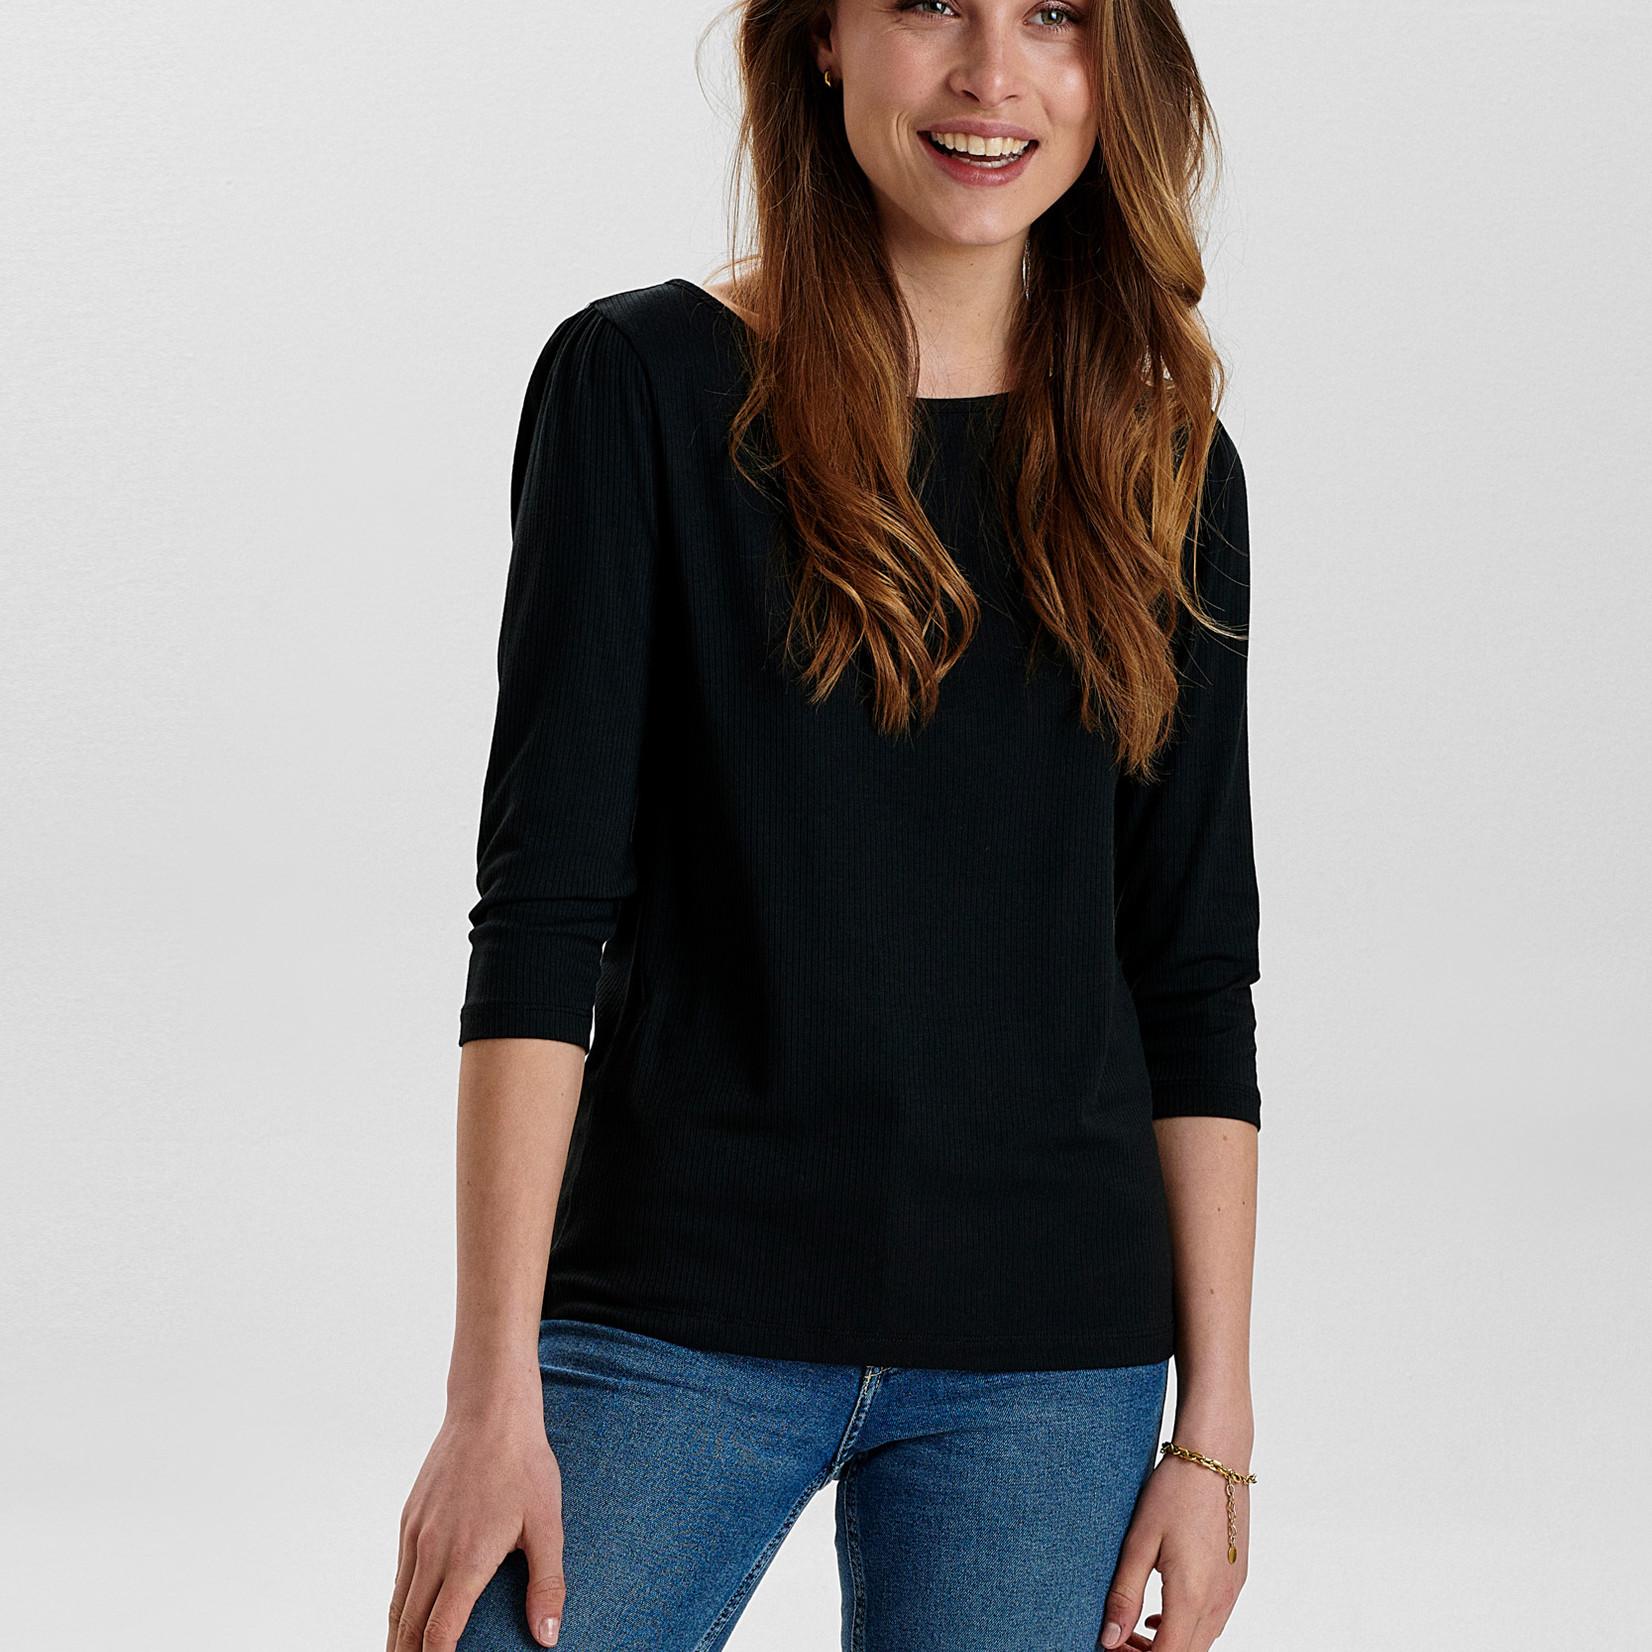 NÜMPH NUDARI T-SHIRT, basic shirt 3/4 mouw